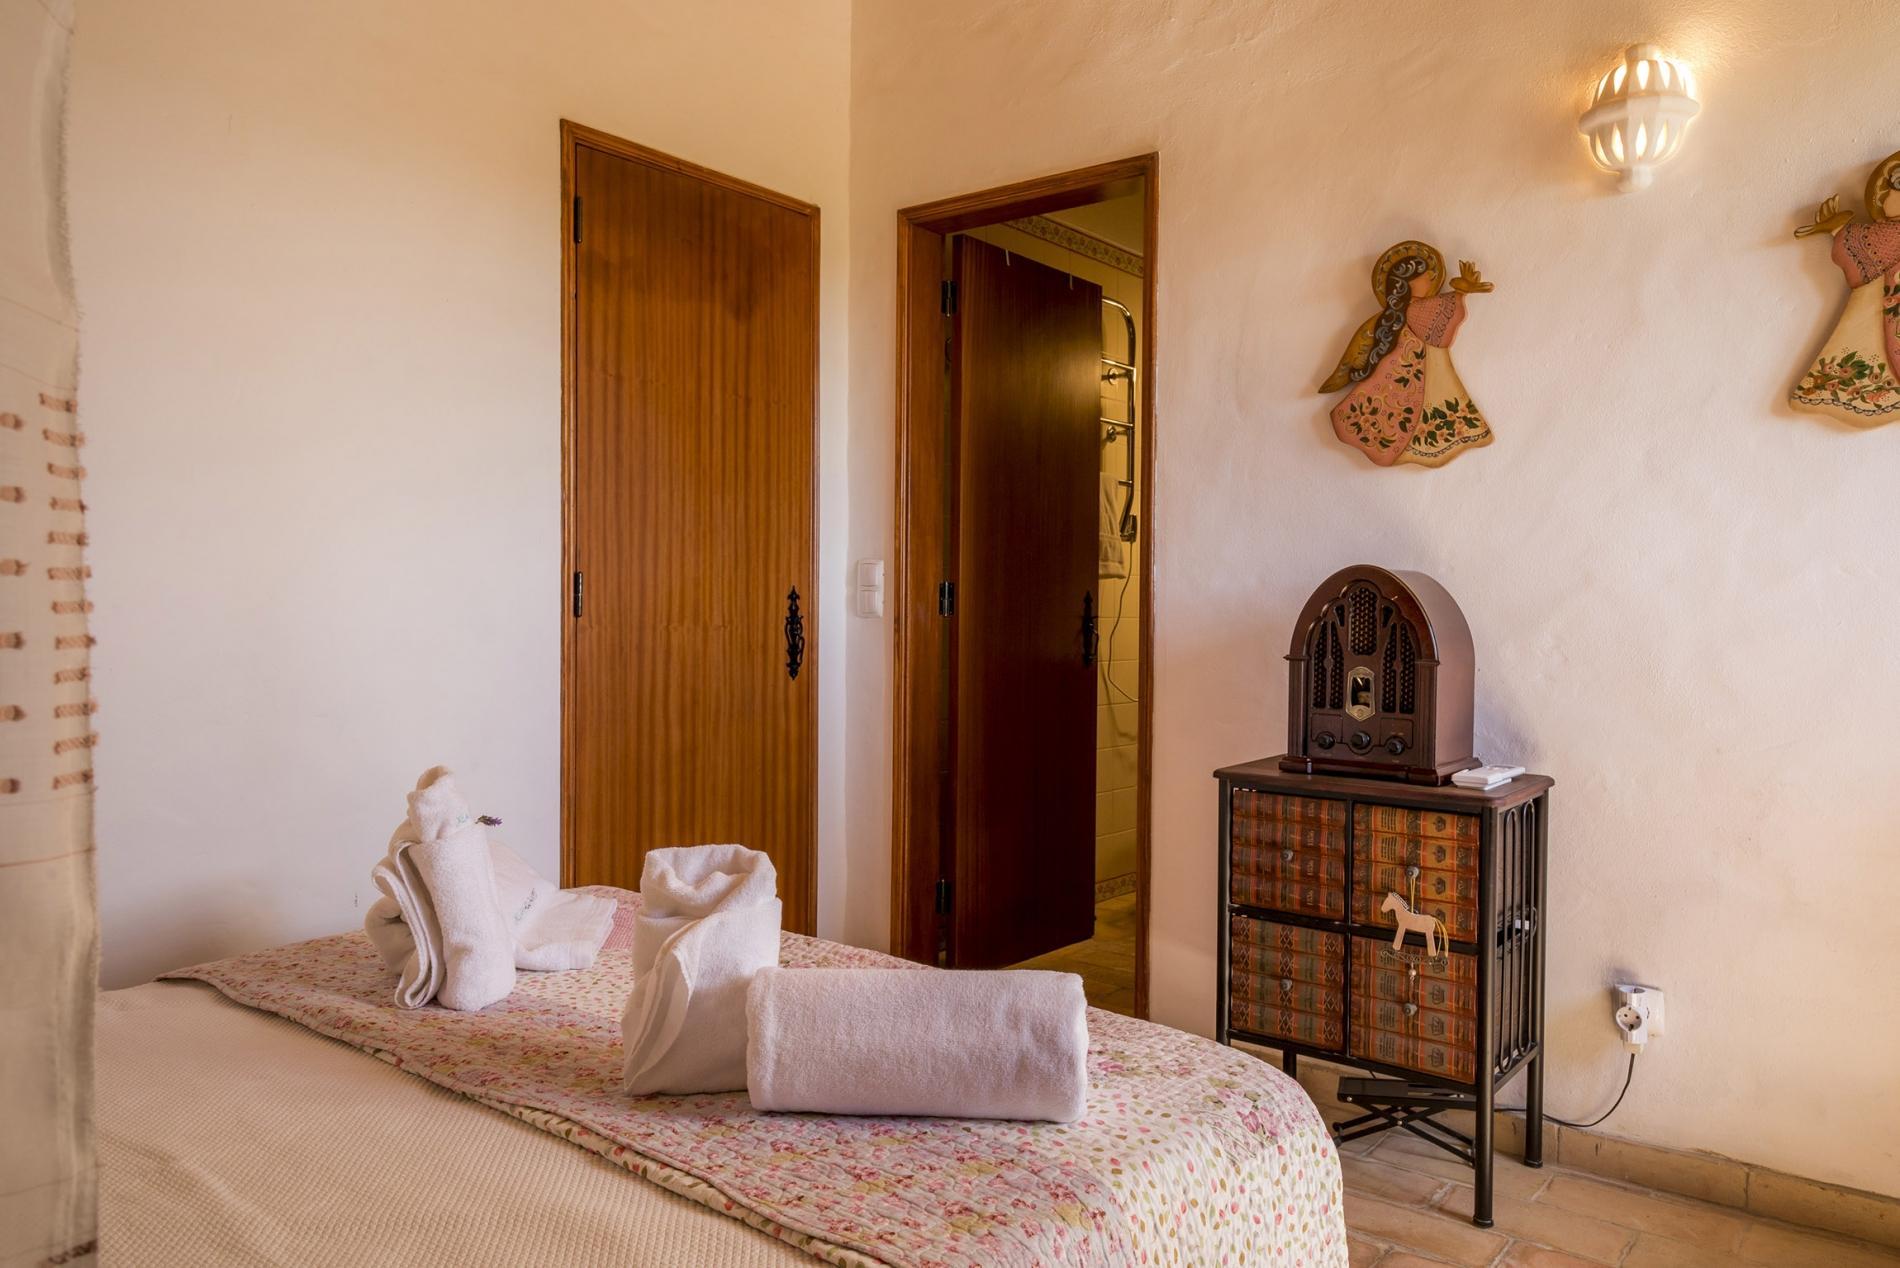 Apartment F - Casa do Vigia in Quinta das Alagoas photo 18448038